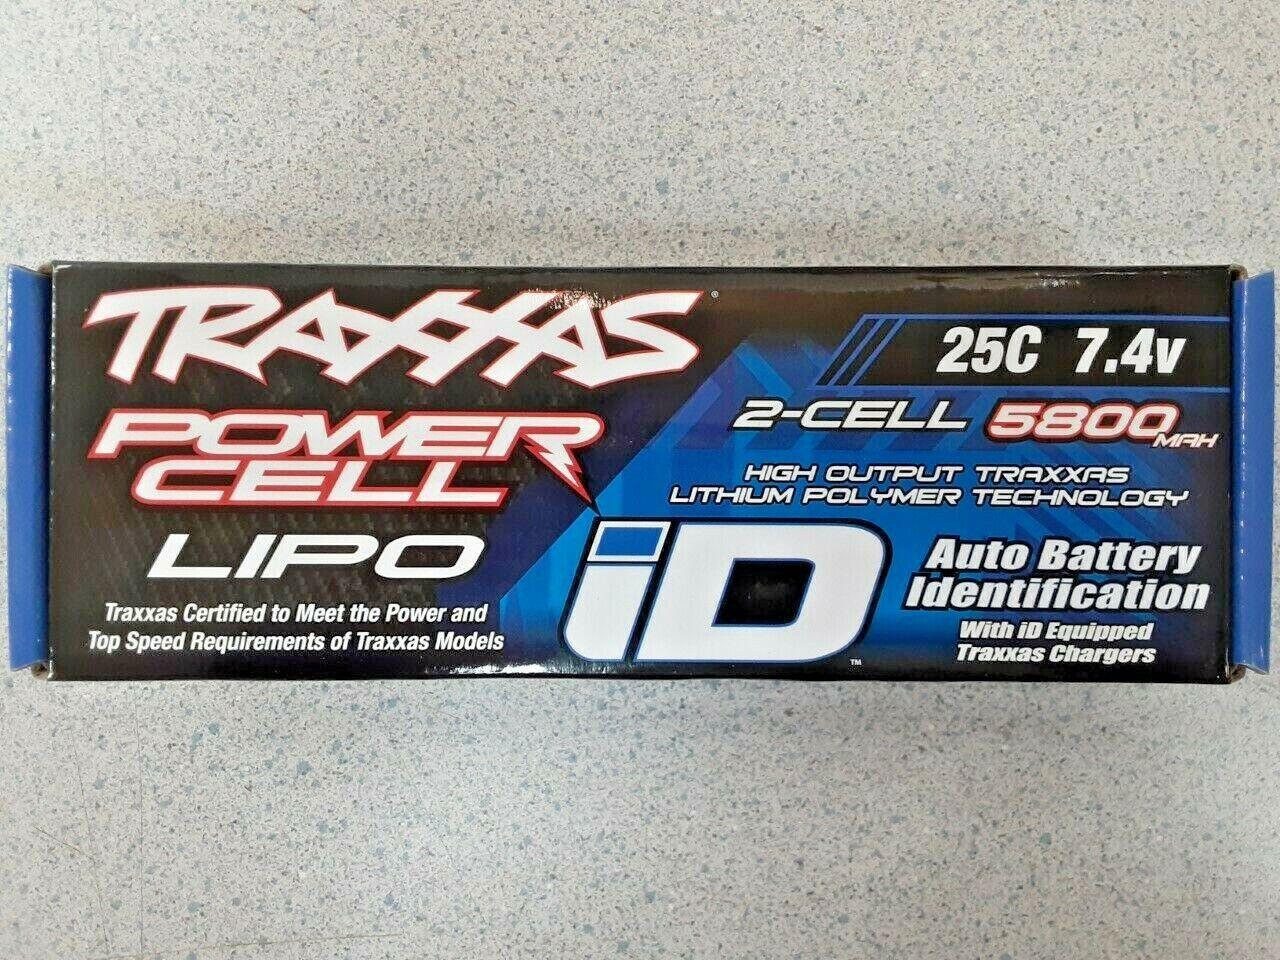 Traxxas 2S 25C LiPo Battery w/iD Traxxas Connector 7.4V/5800